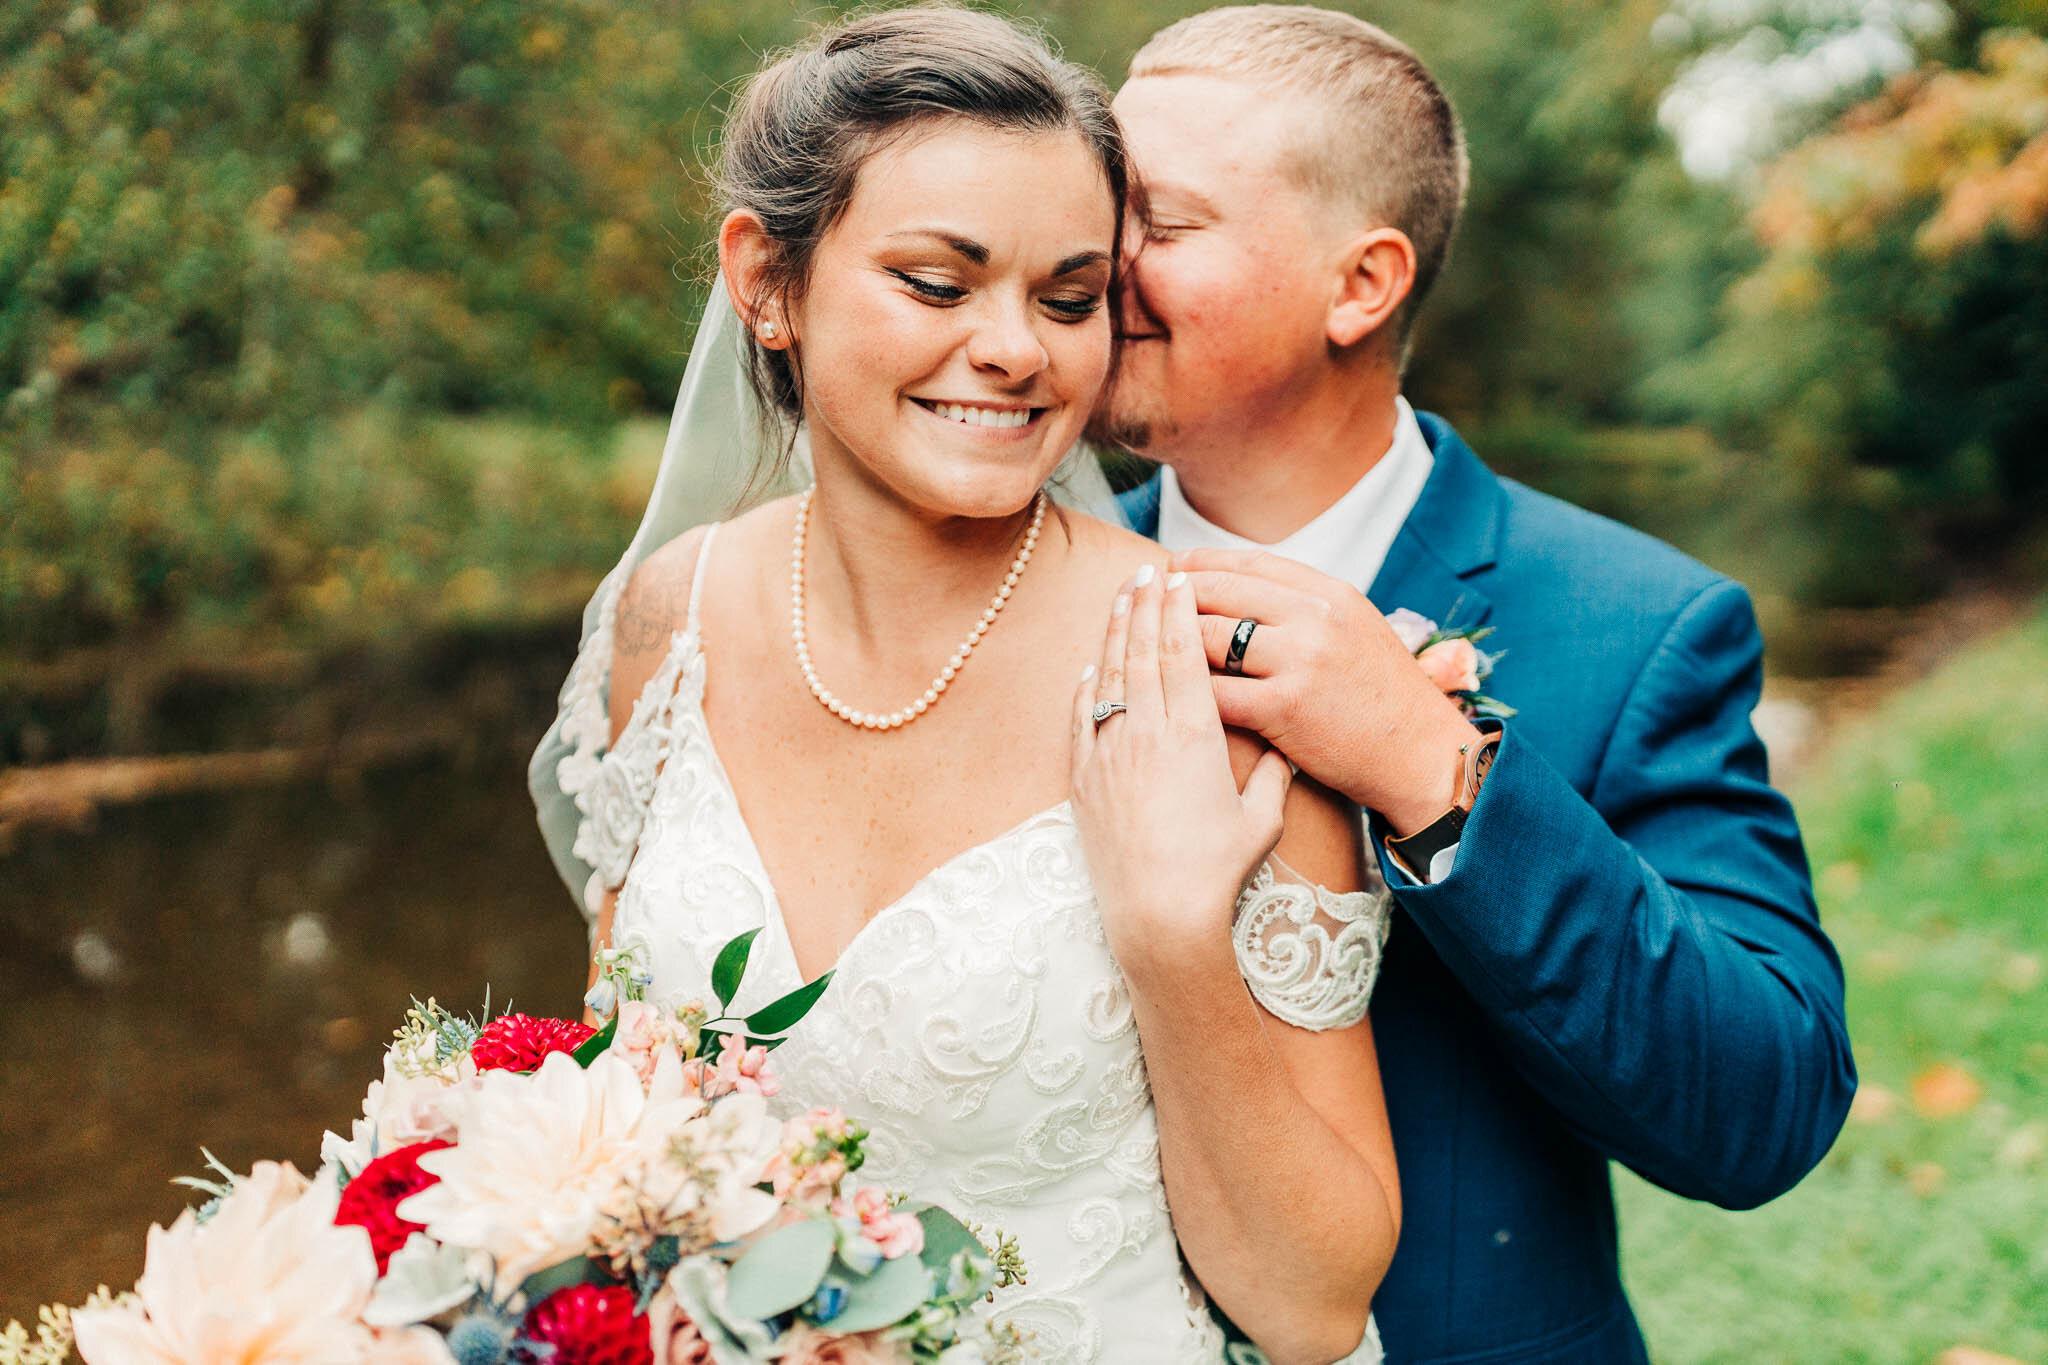 whitewoods-fall-wedding-8352.jpg